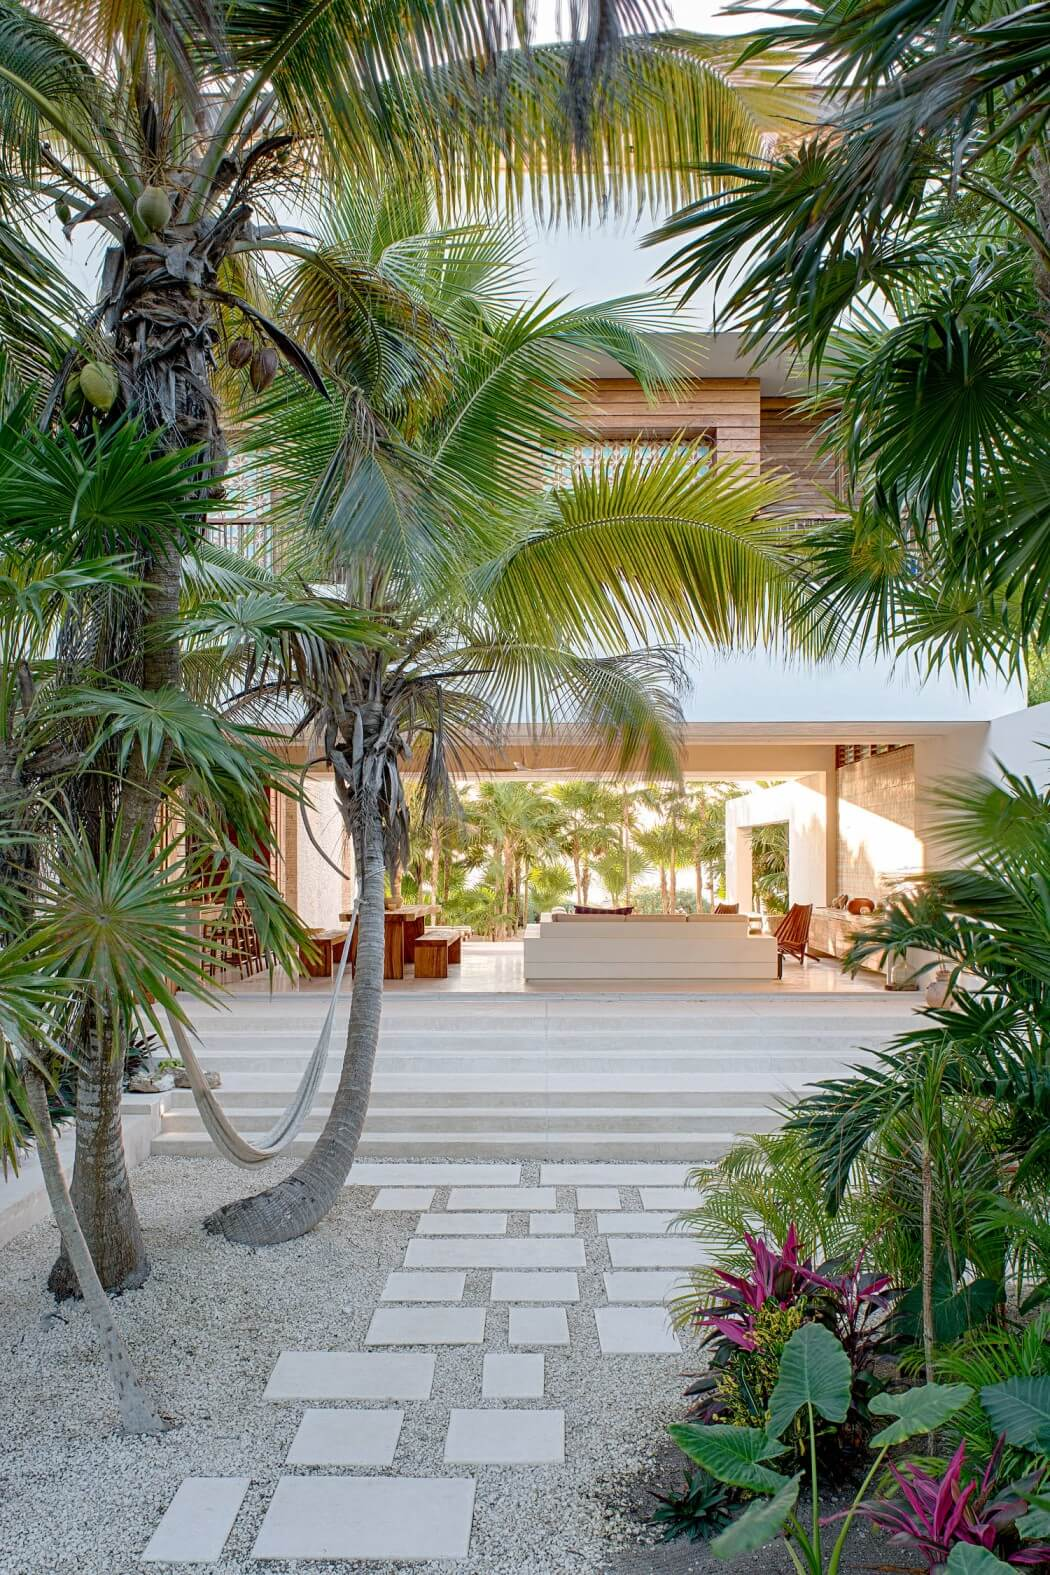 003-casa-xixim-specht-harpman-architects-1050x1575